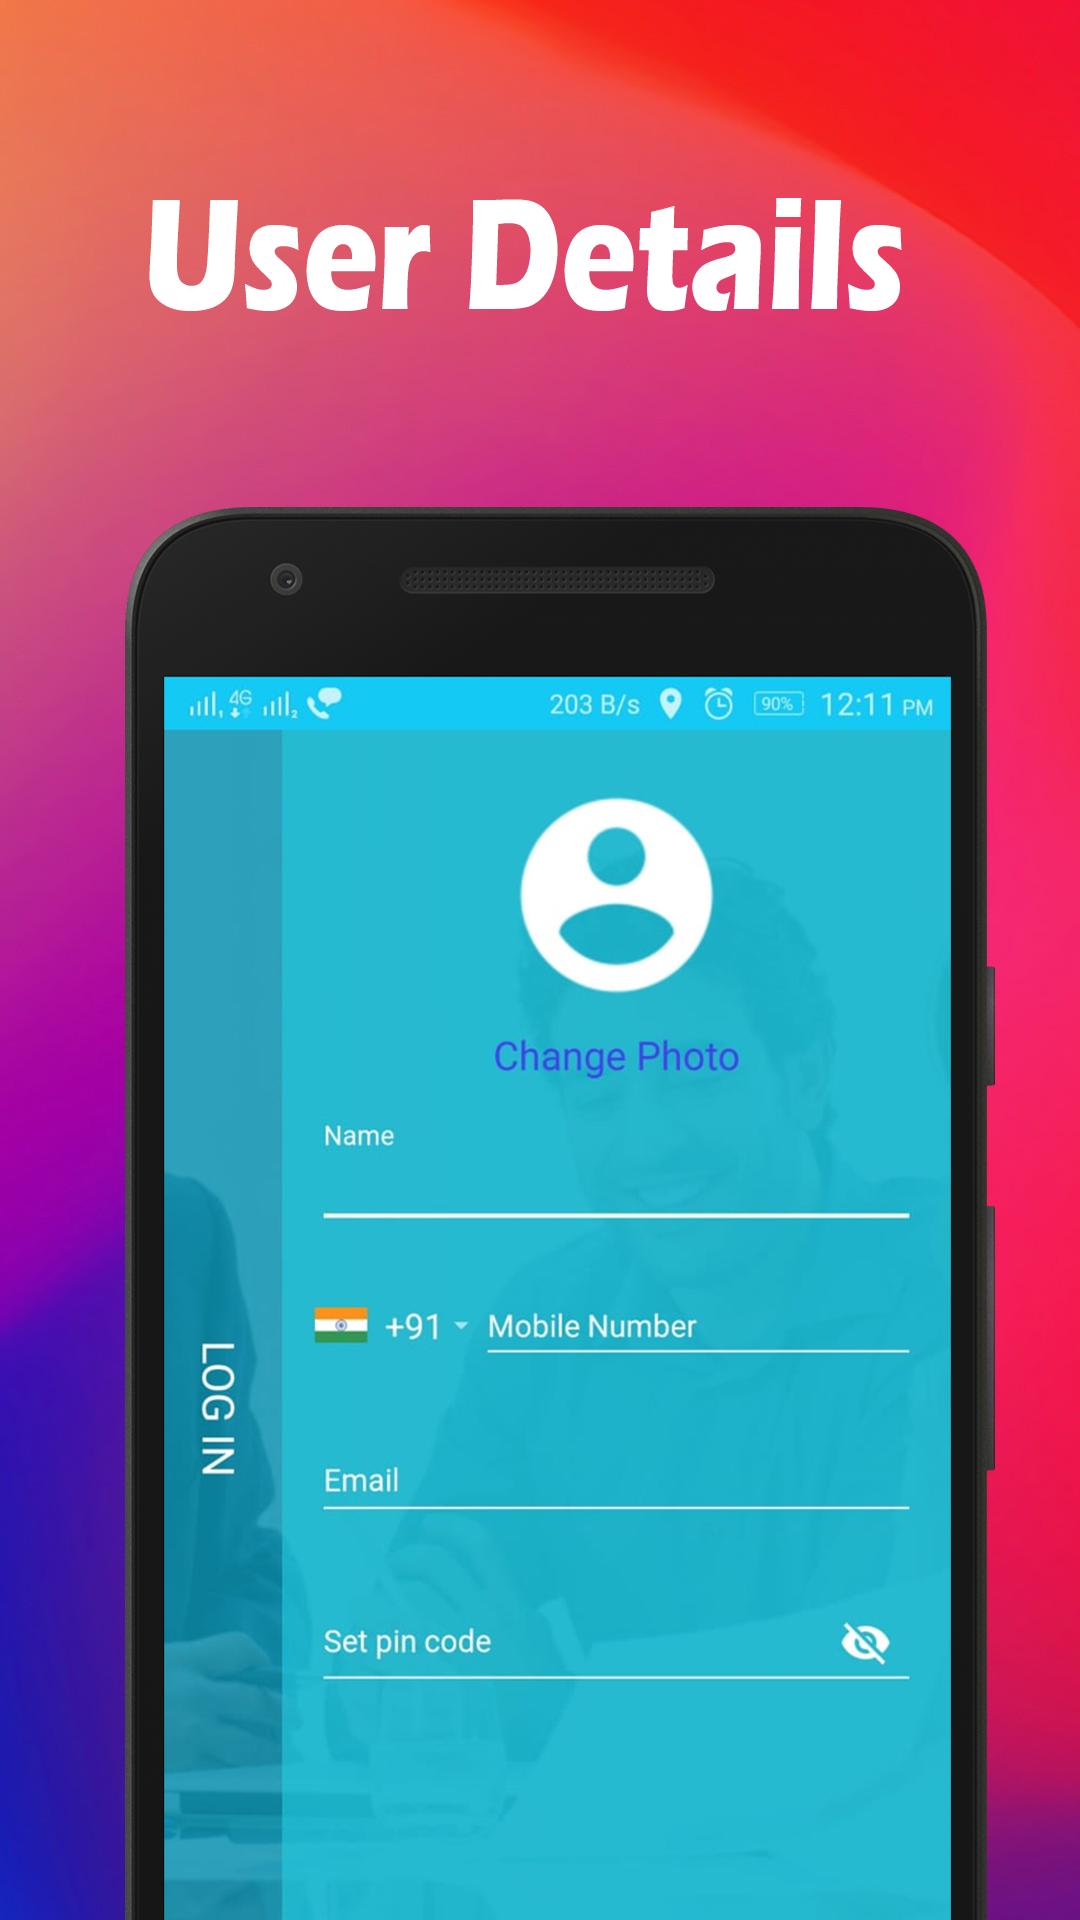 TimeKompas Selfie & GPS based Attendance & Payroll mobile